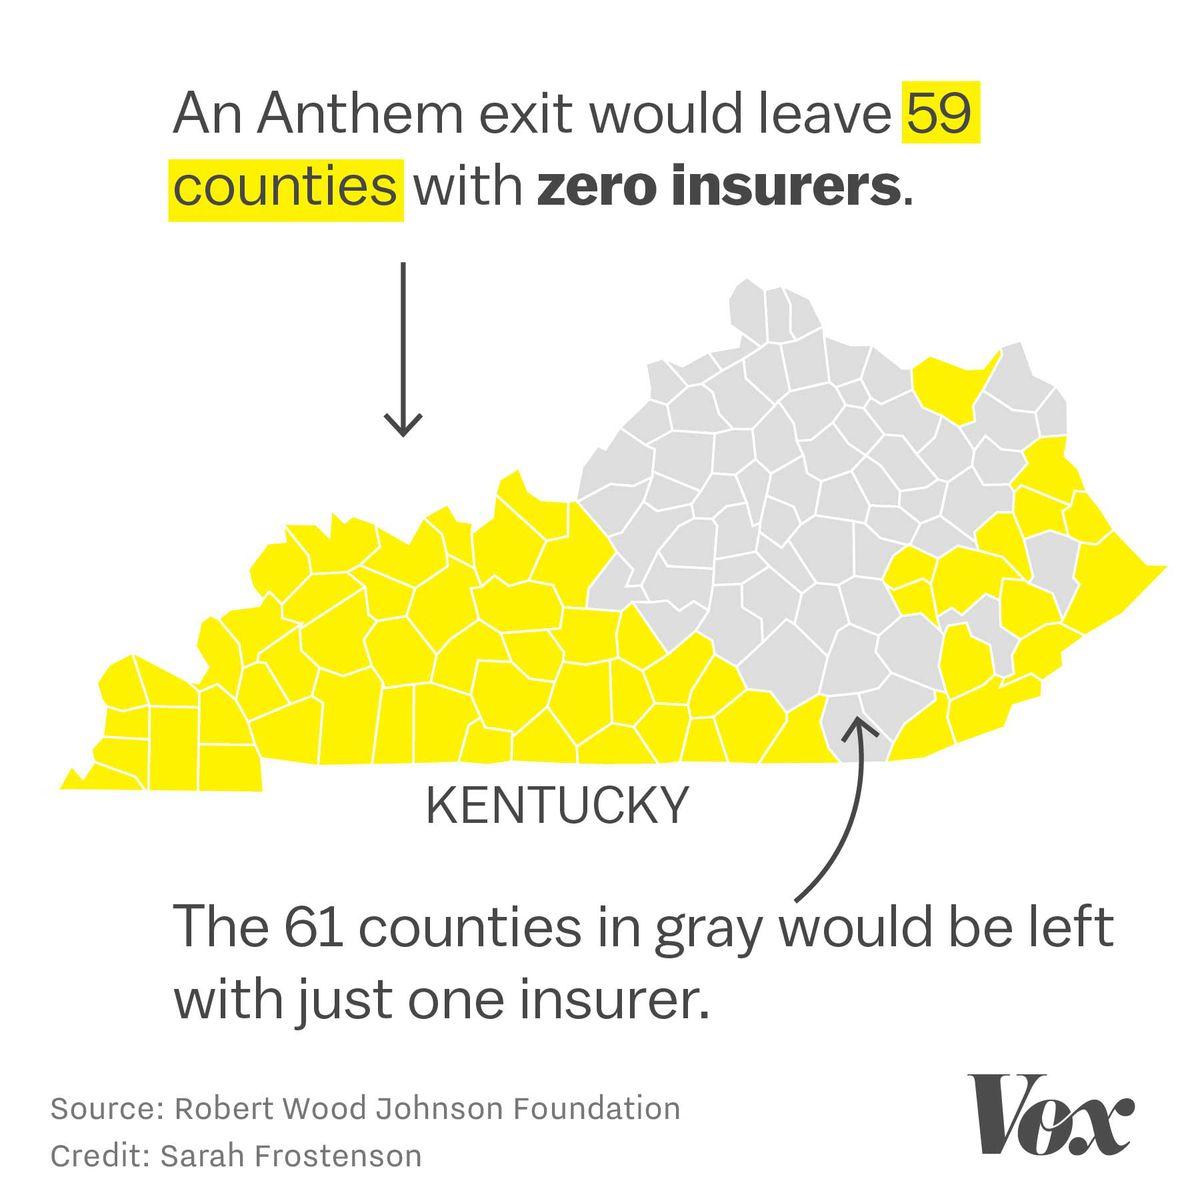 Map of Anthem's footprint in Kentucky